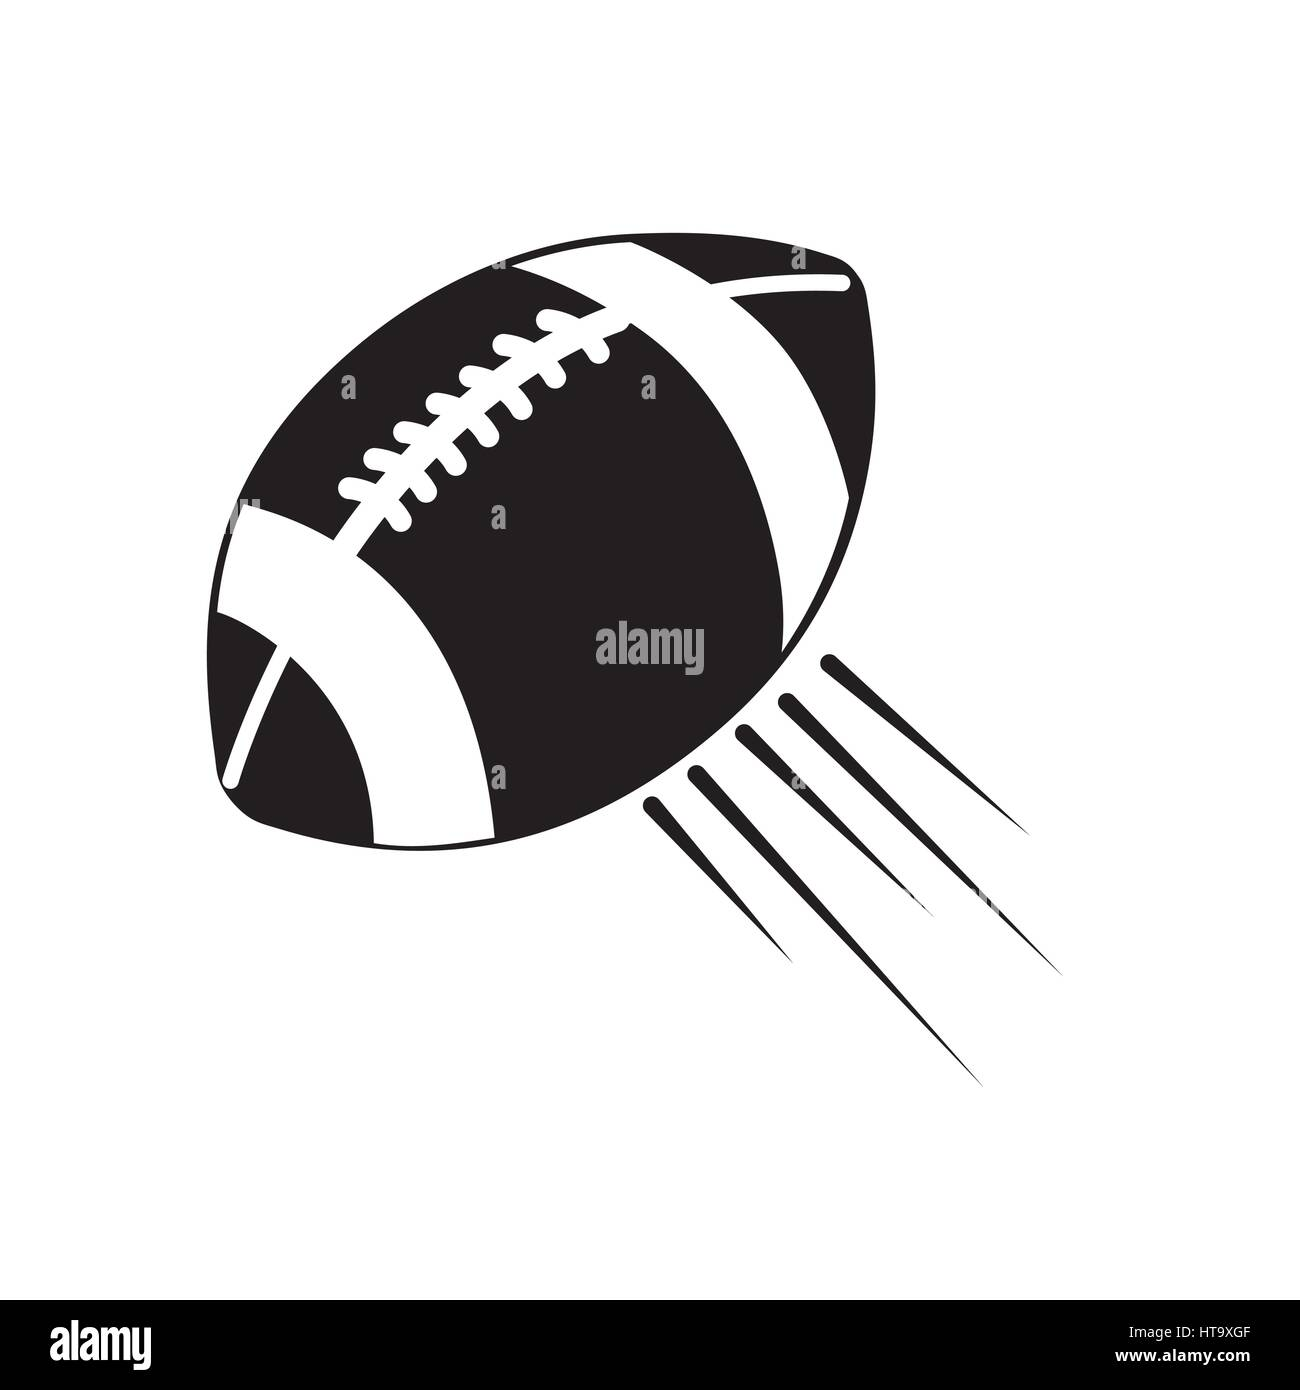 contour american football and his ball icon Stock Vector